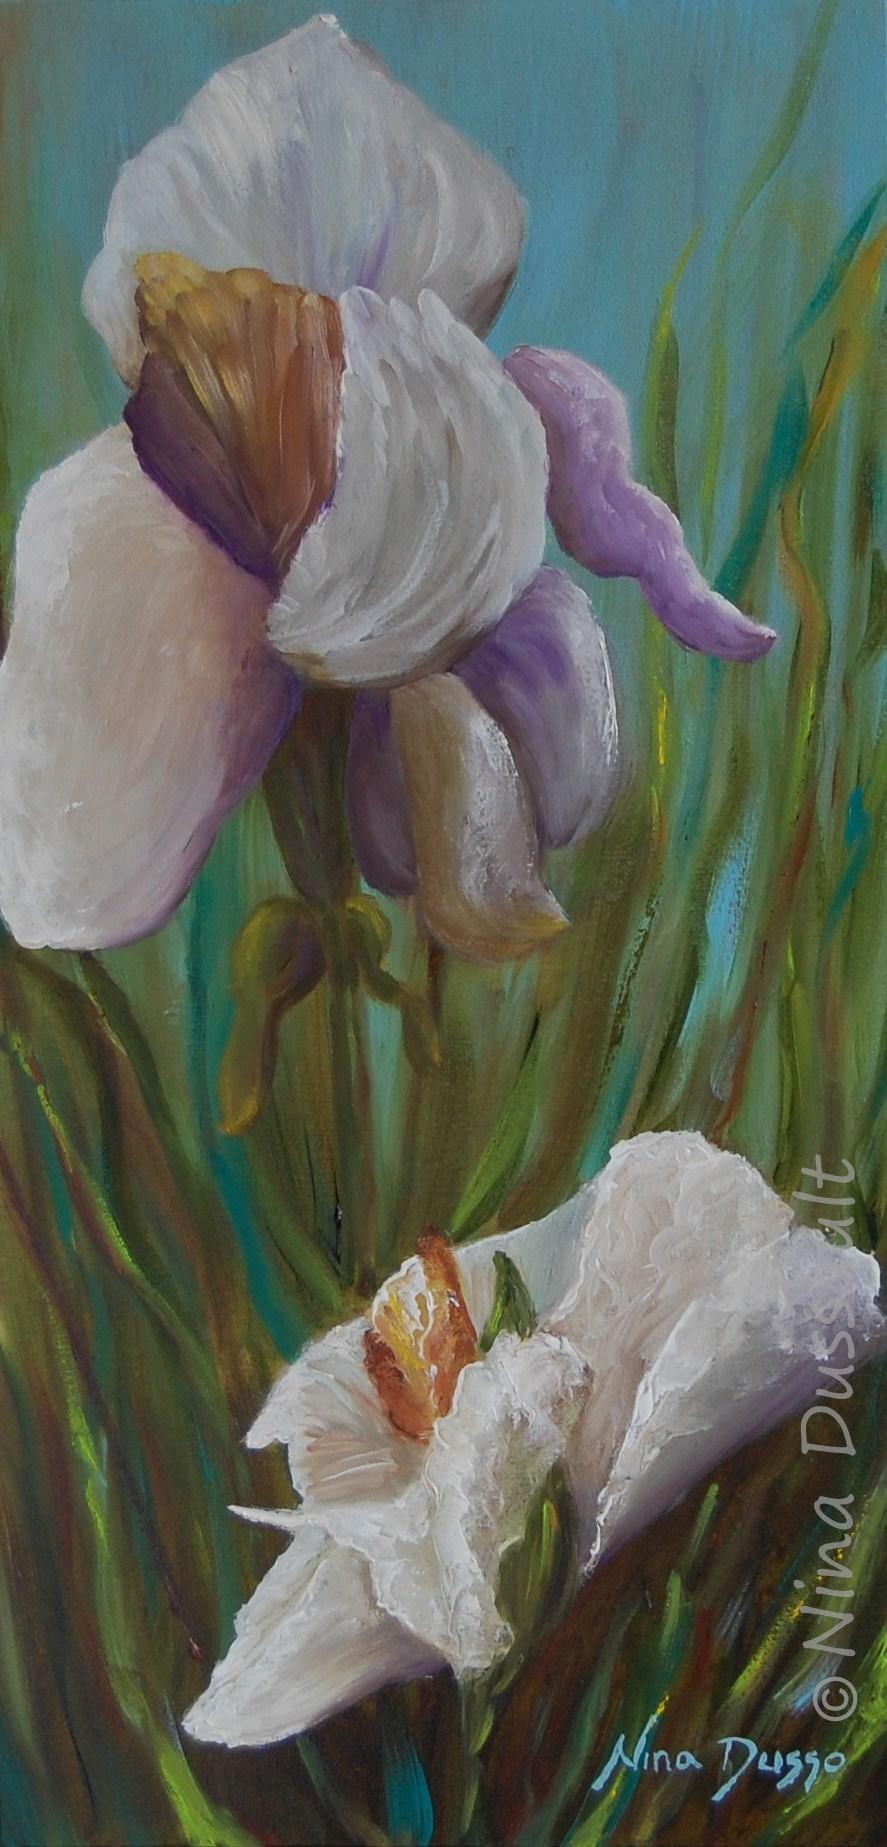 Iris blanc en beauté